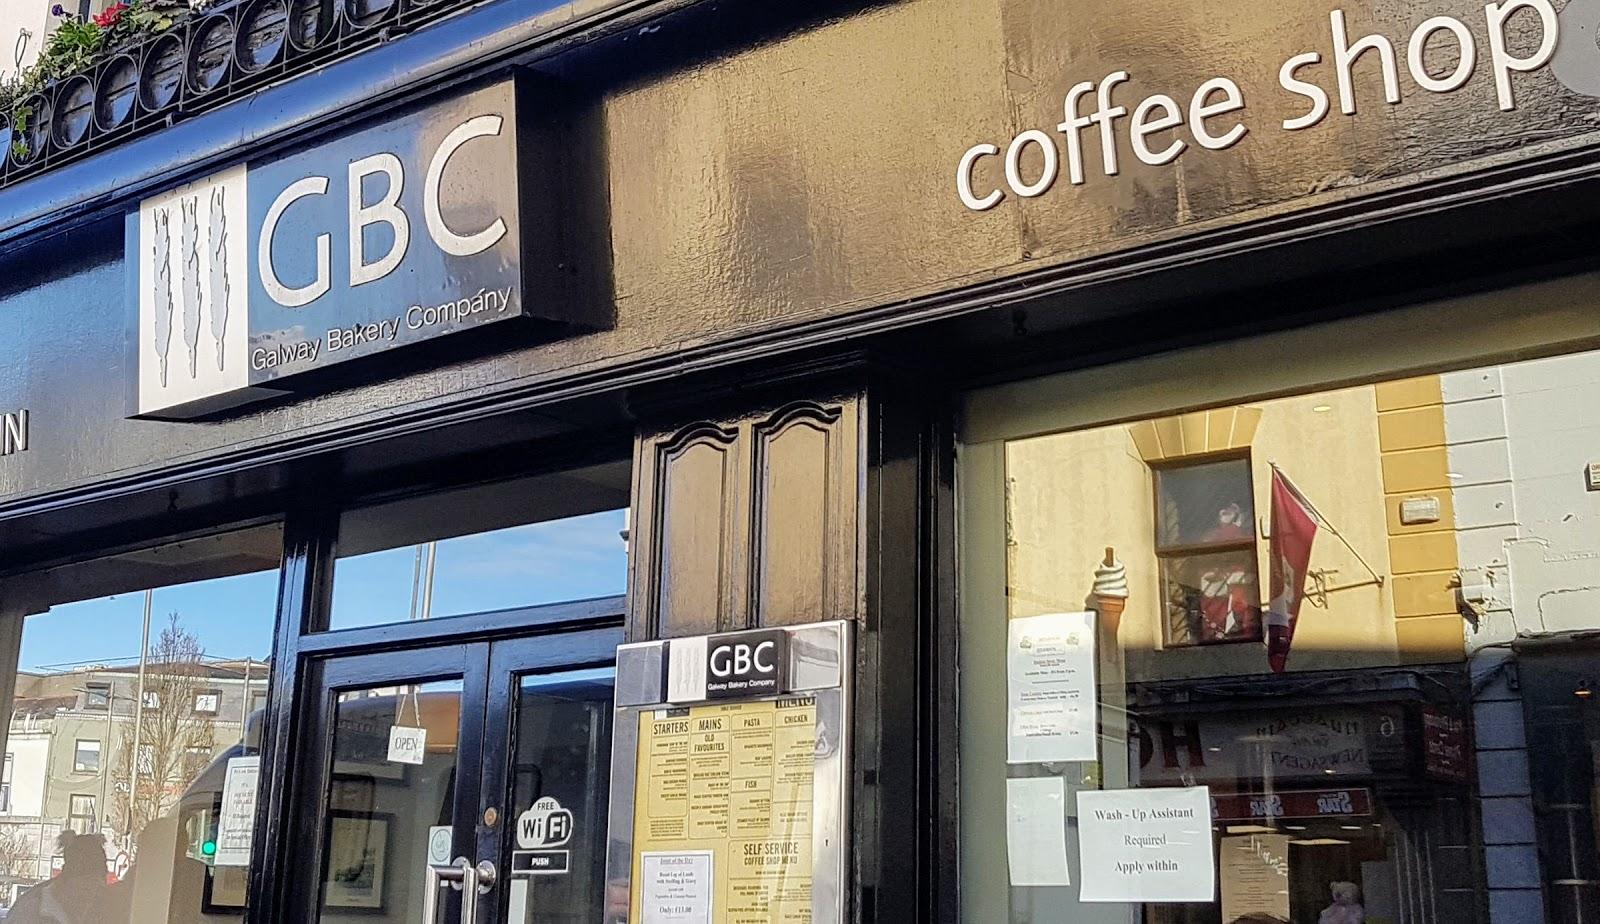 GBC - Galway Baking Company shopfront 2019